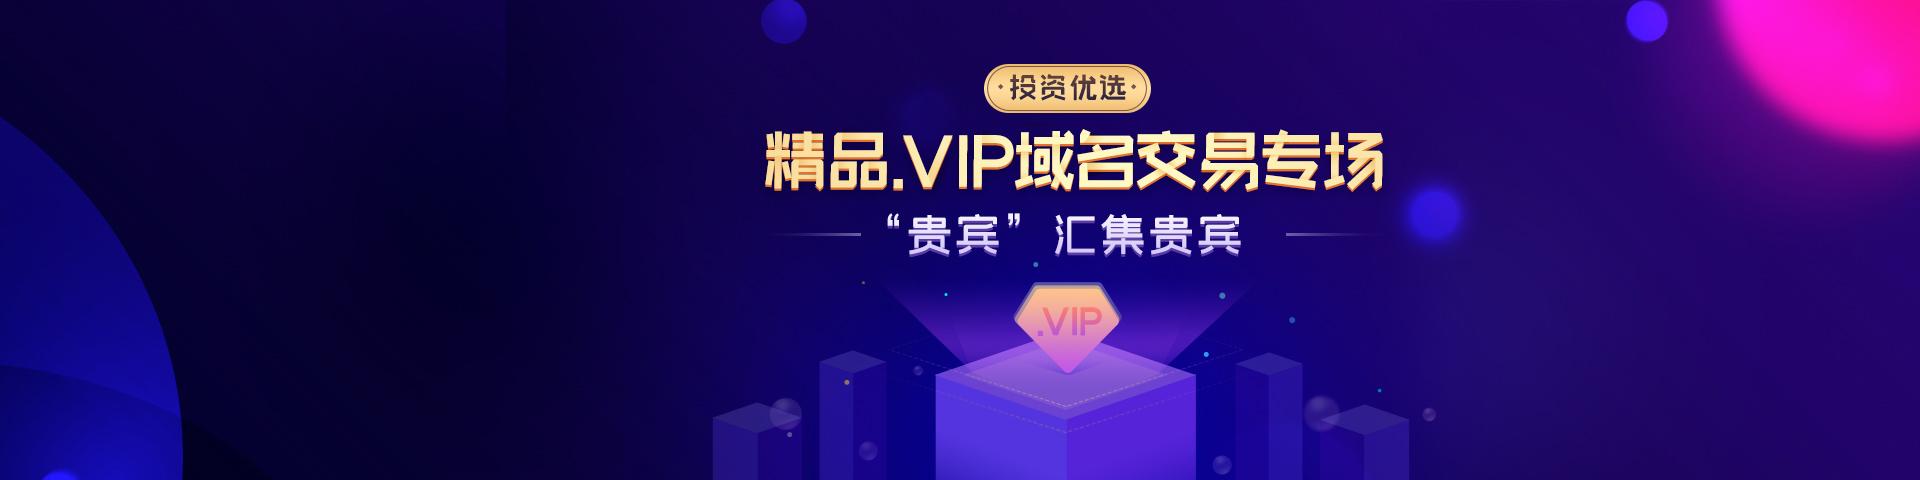 .vip交易精选